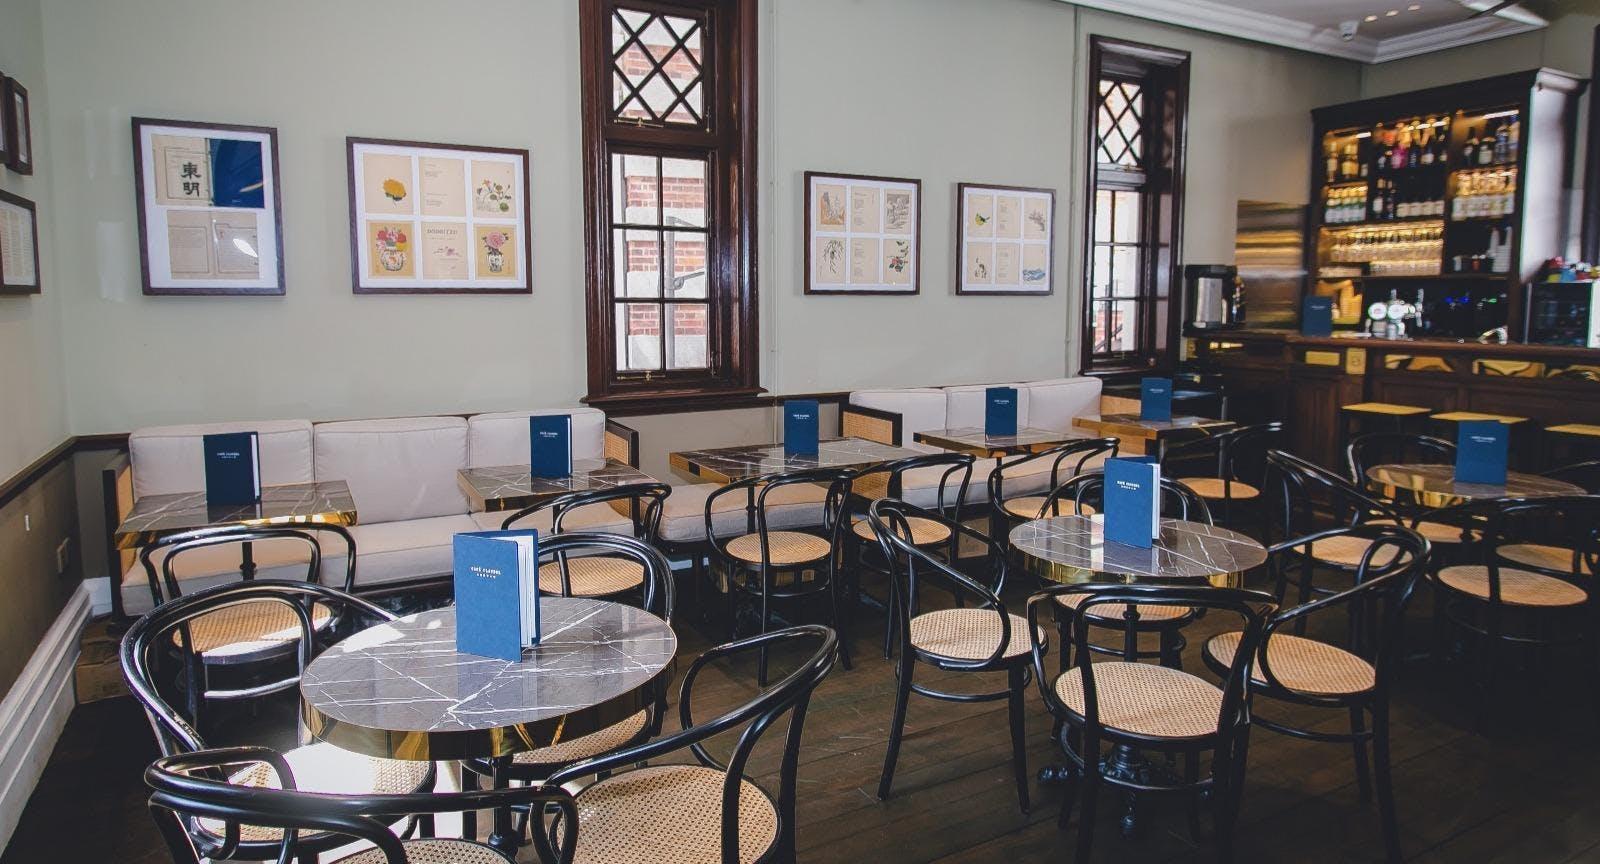 Café Claudel Hong Kong image 2